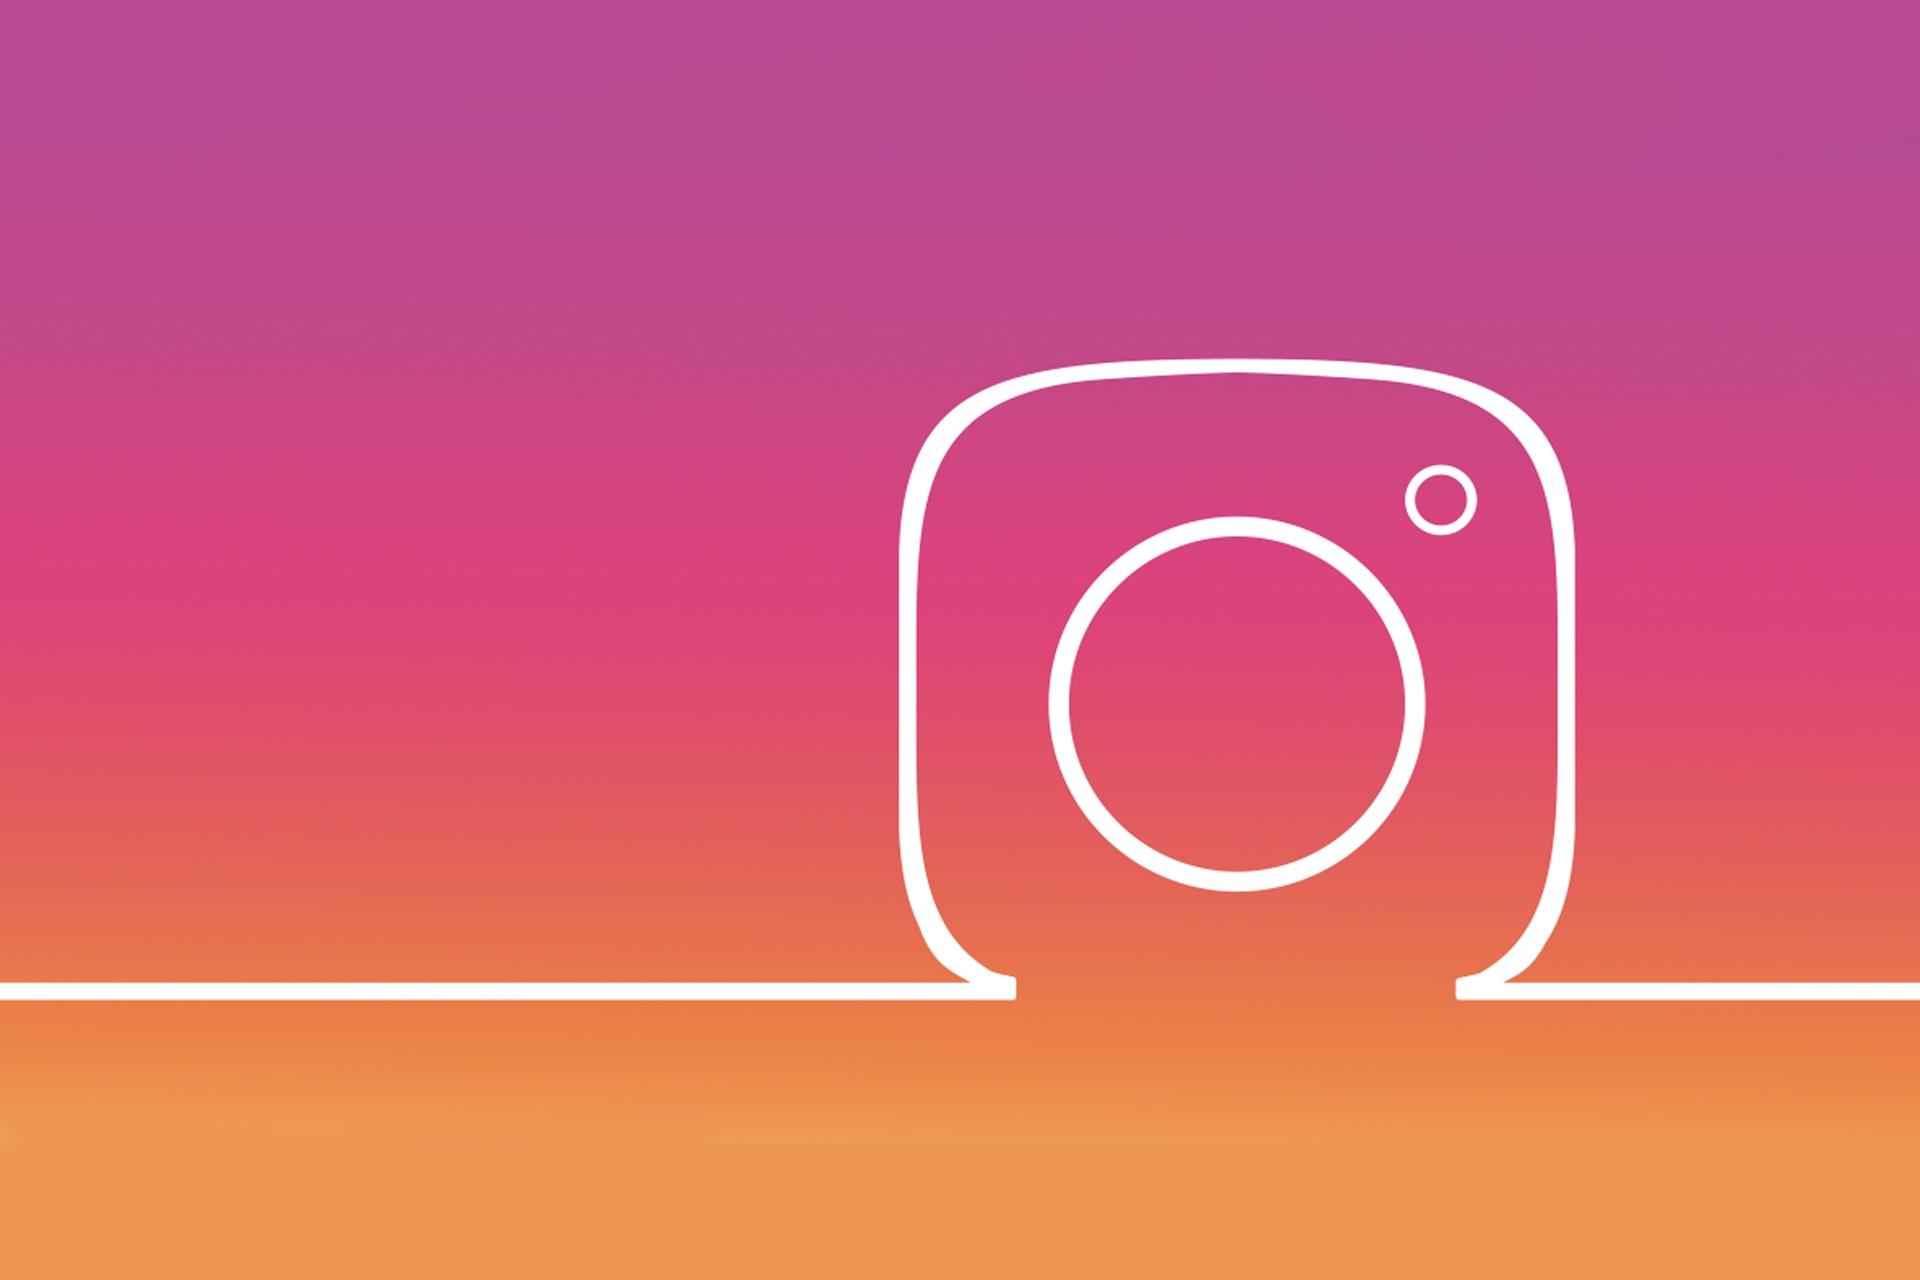 Instagramin yritystili - näin otat yritysprofiilin hyödyt käyttöön